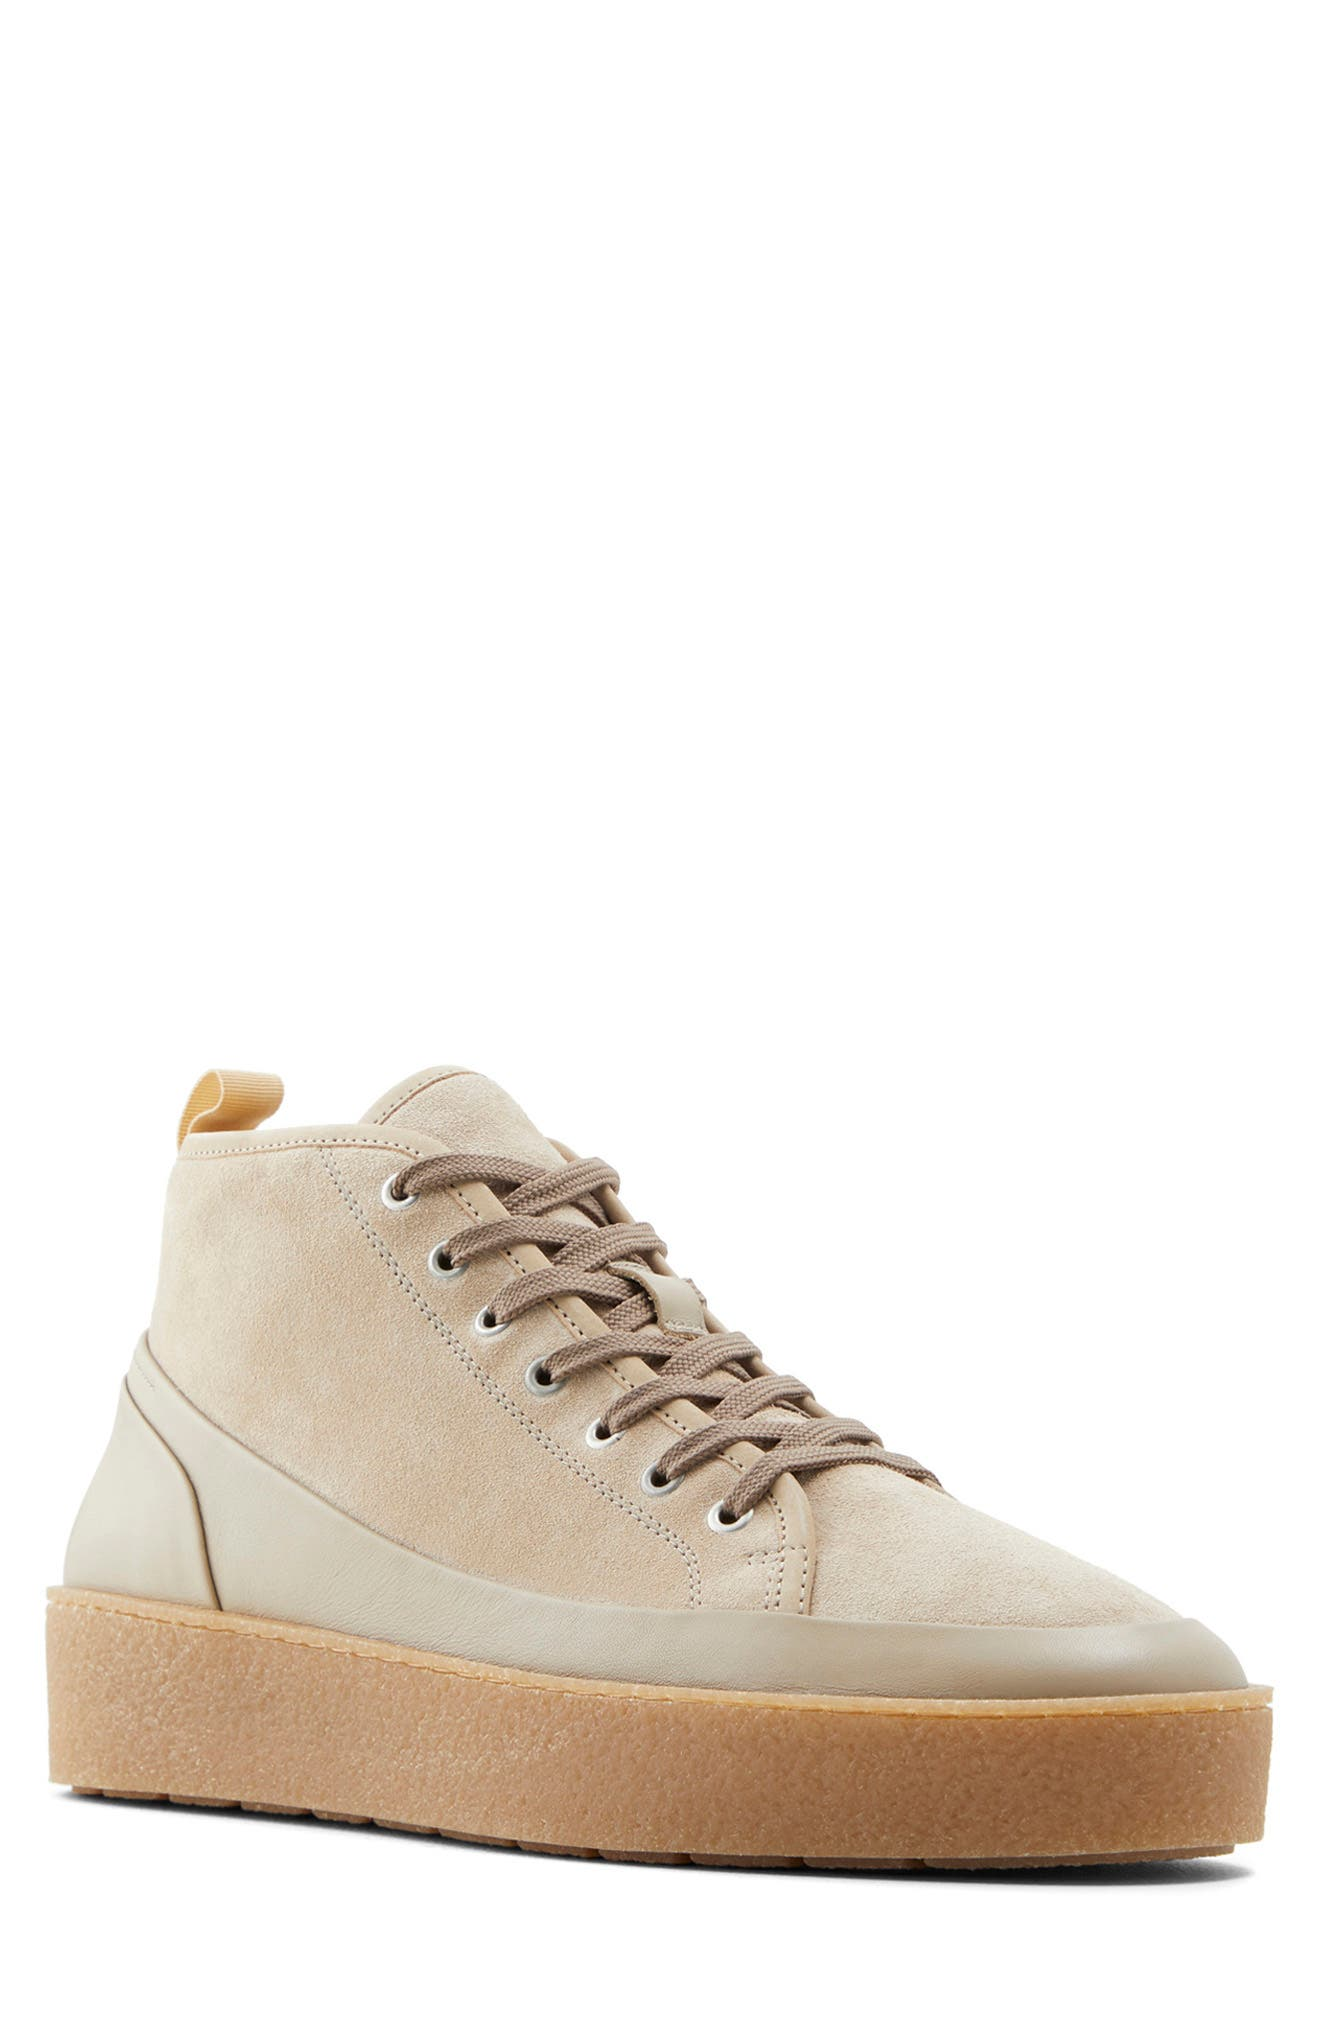 Men's Mr. B's Peggyryan Sneaker